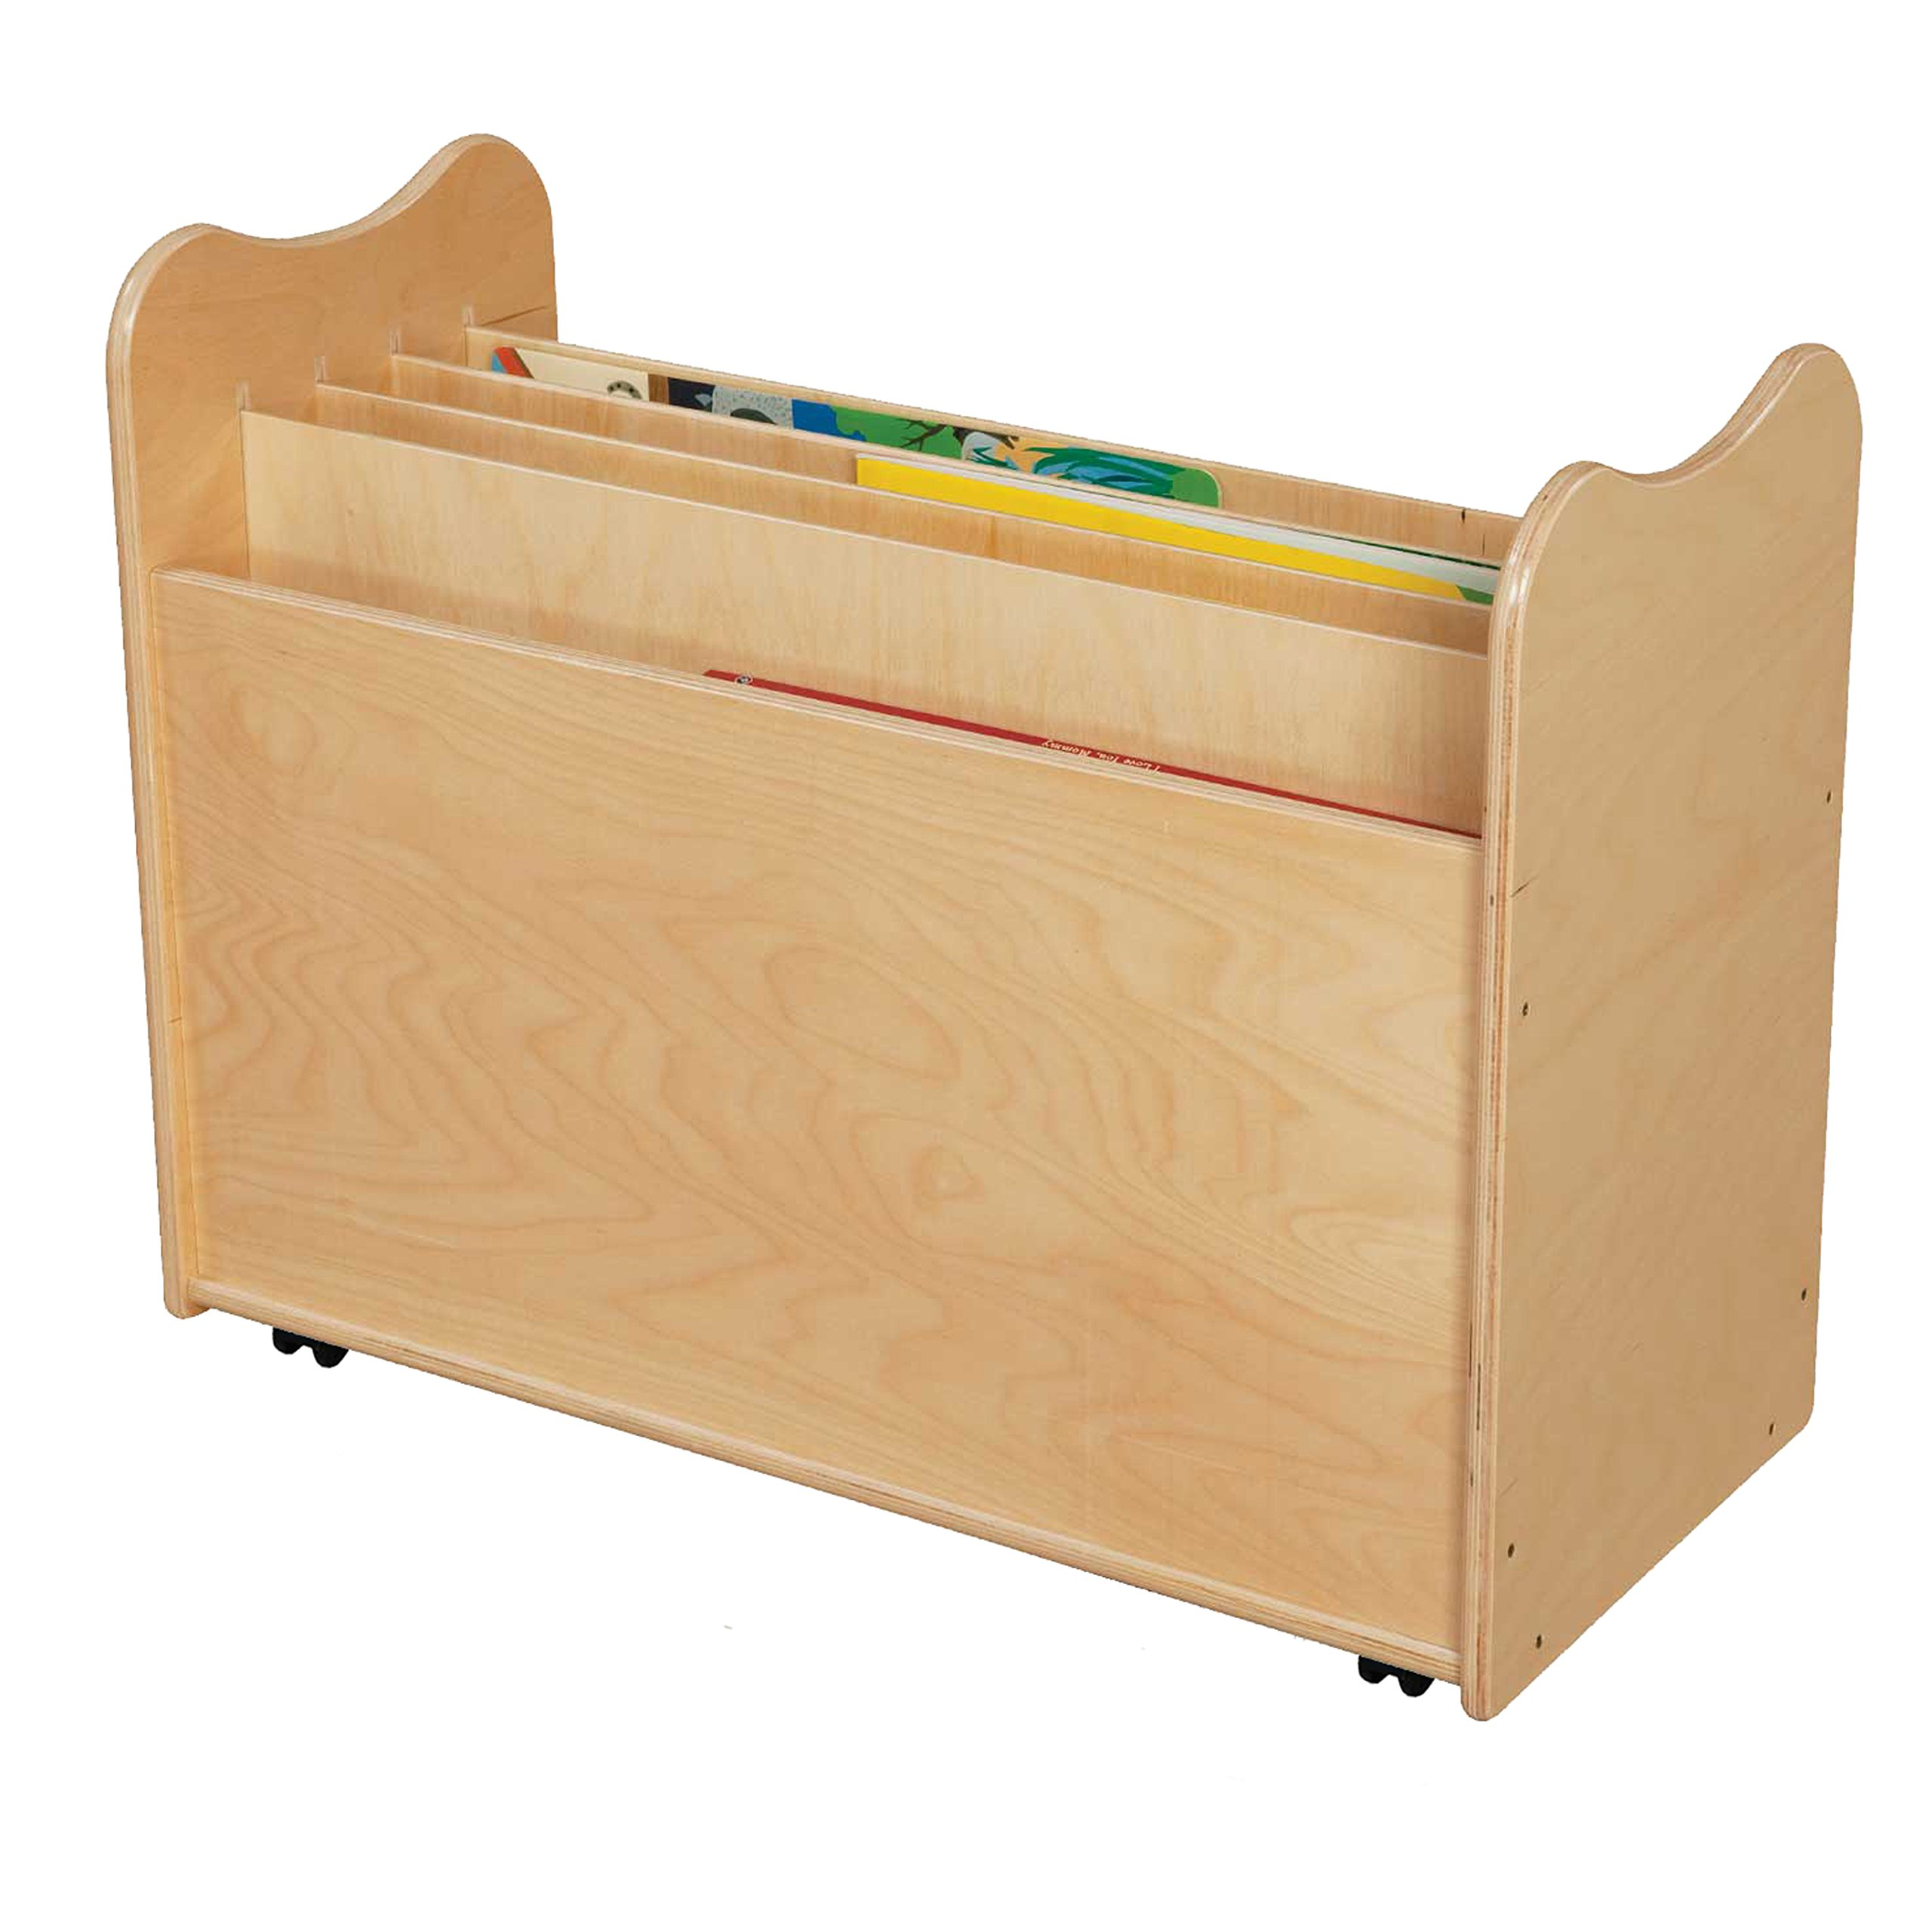 Wood Designs WD34600 Big Book Holder